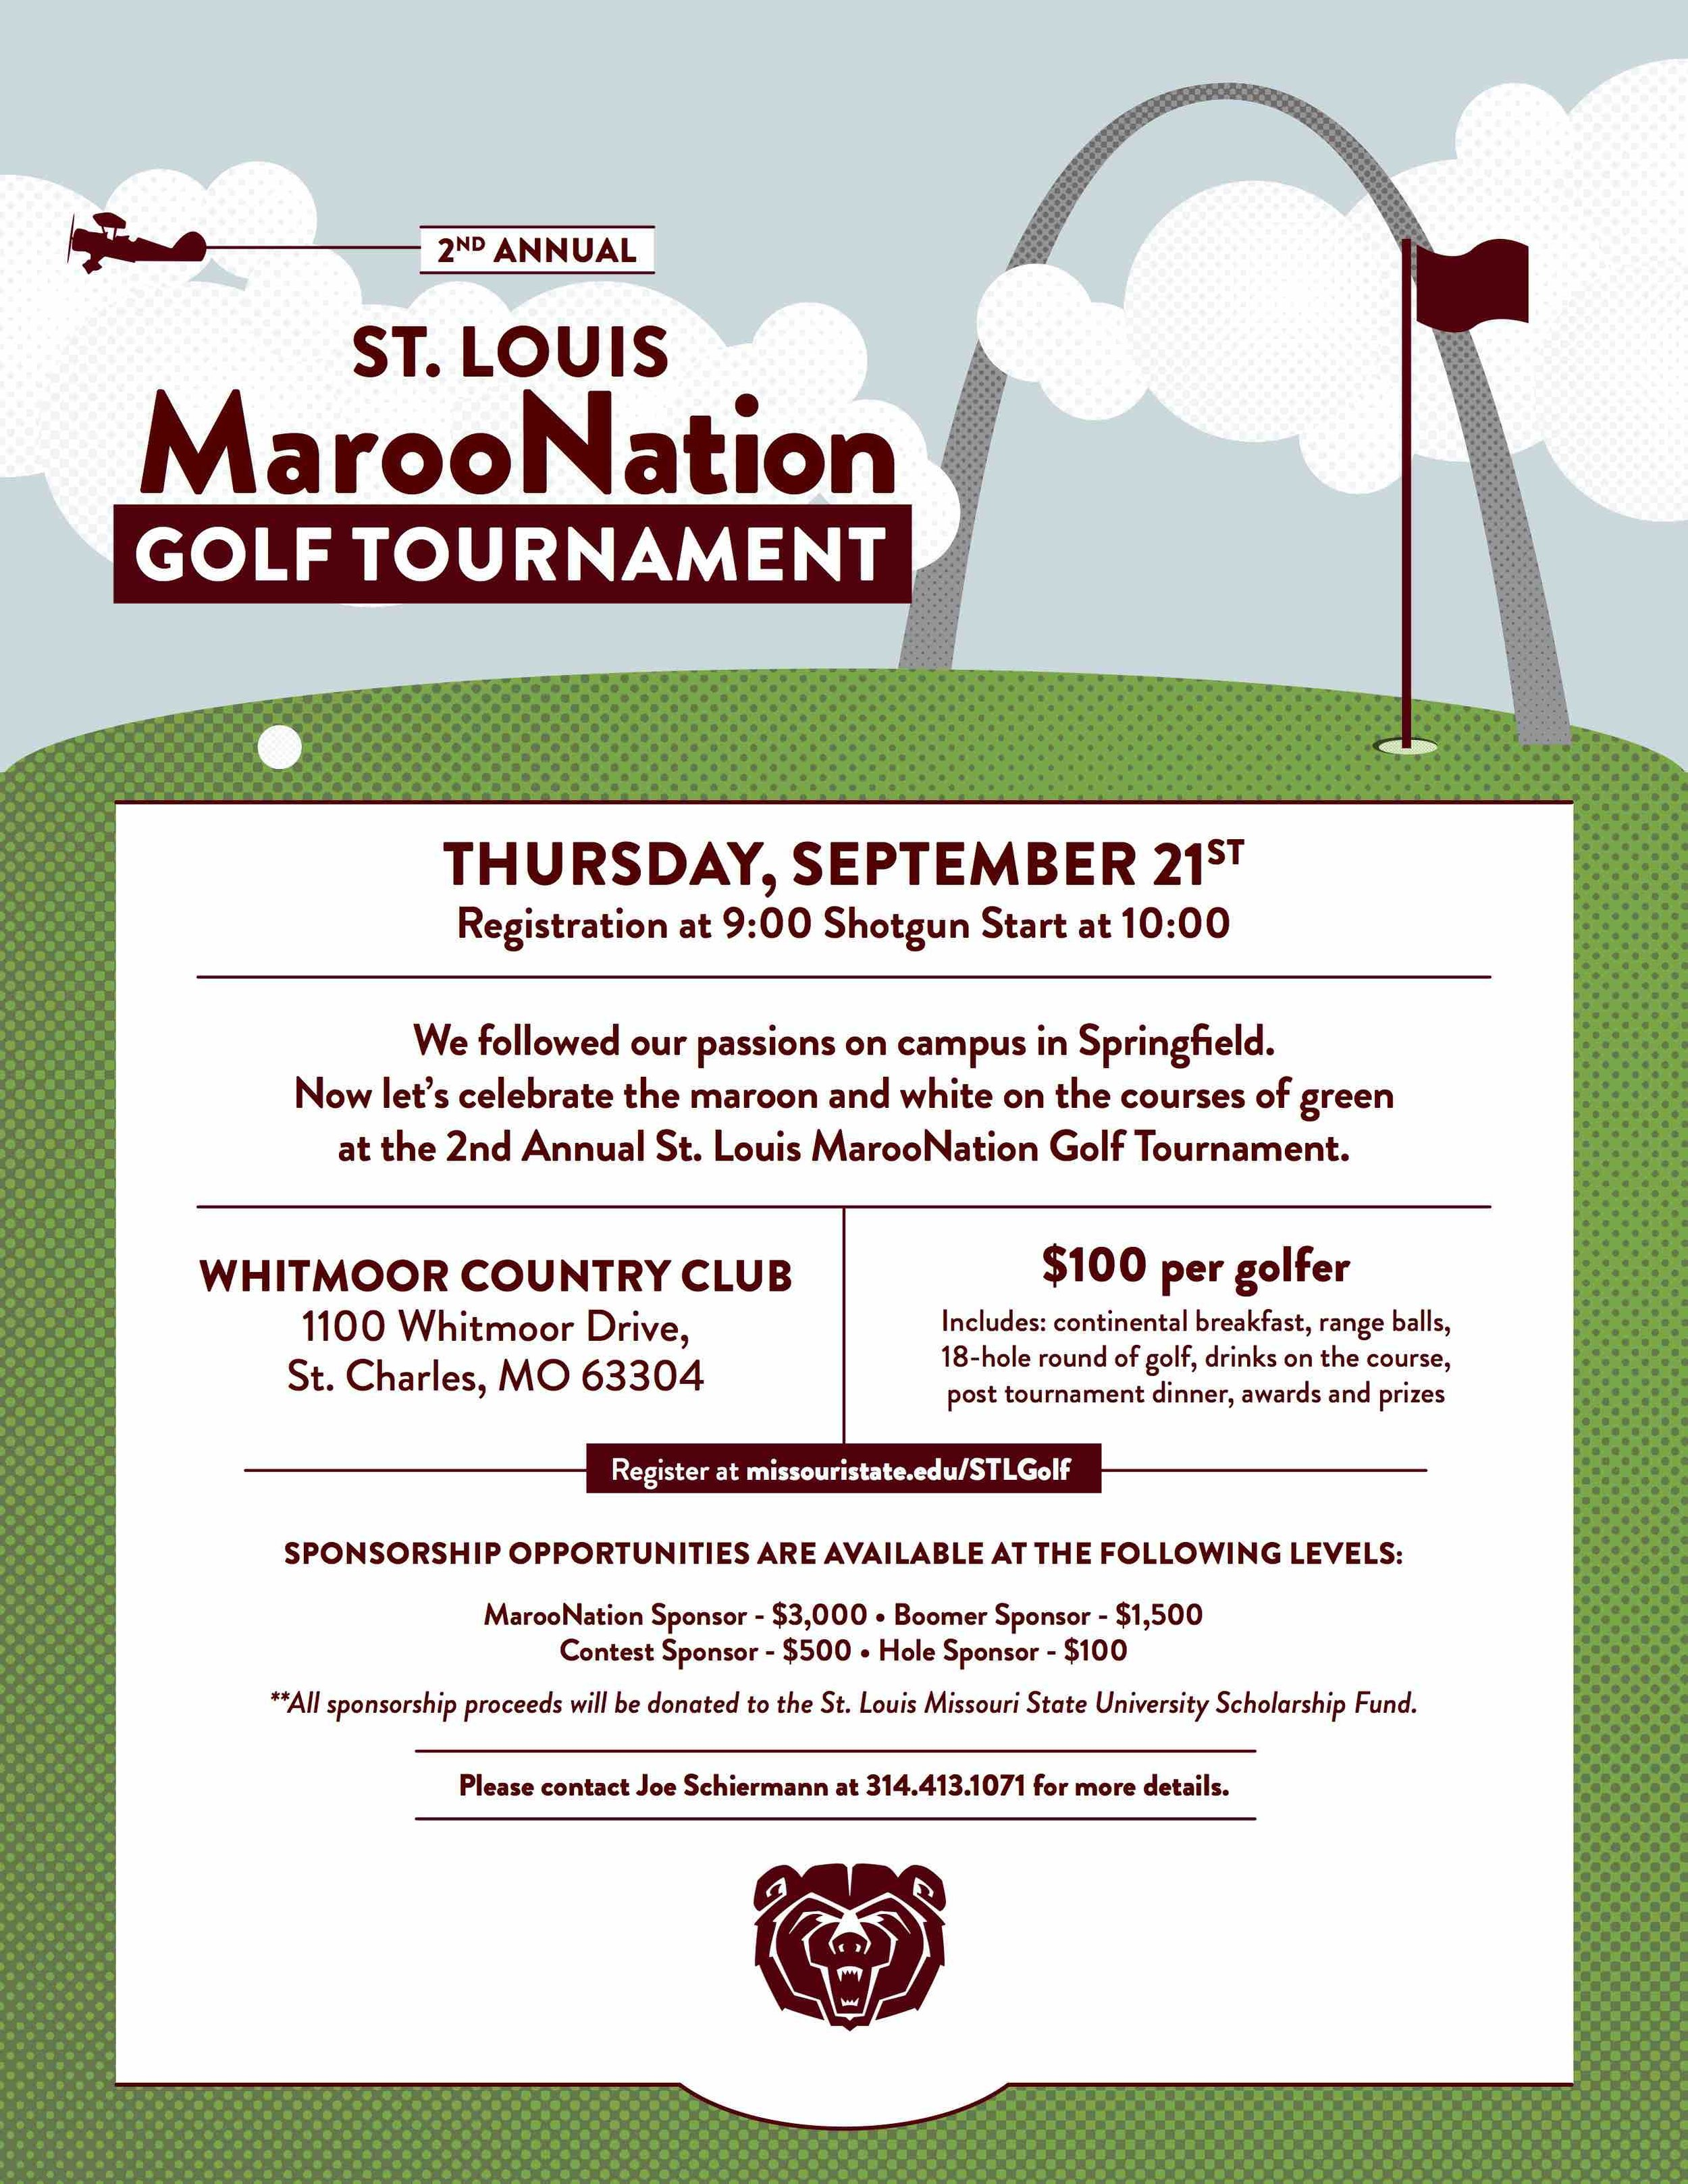 MarooNation-Golf-Tournament-Ellis-Dental.jpg